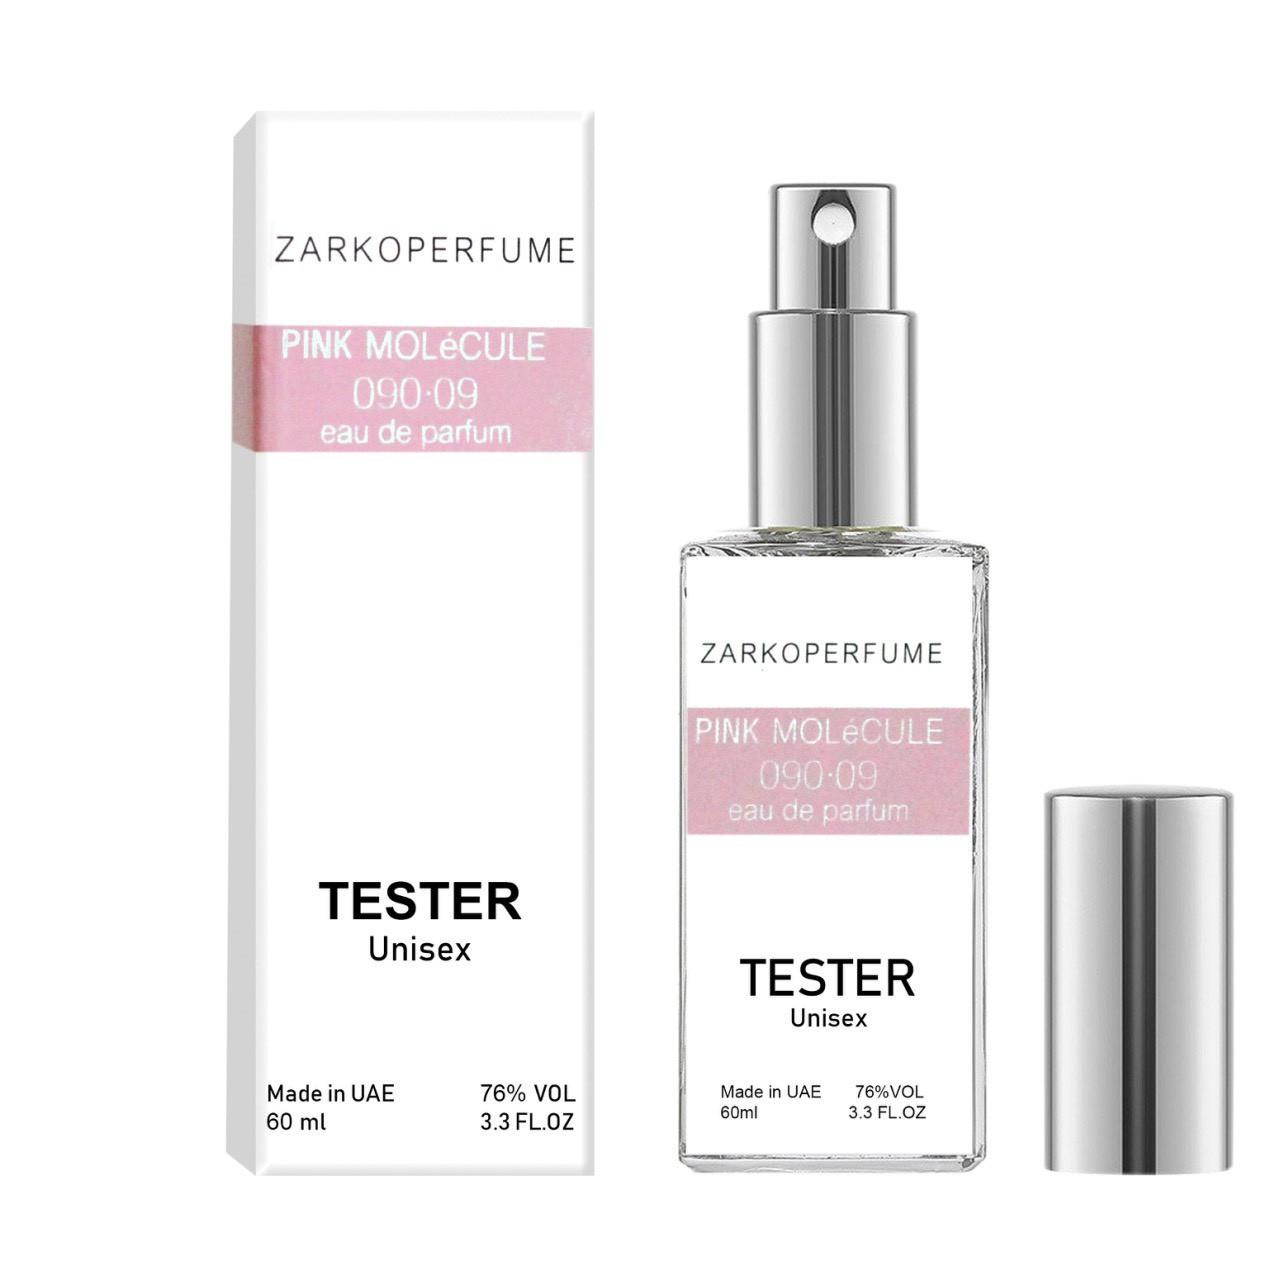 Dejlig Zarkoperfume Pink Molecule - Dubai Tester 60ml: продажа, цена в LB-02